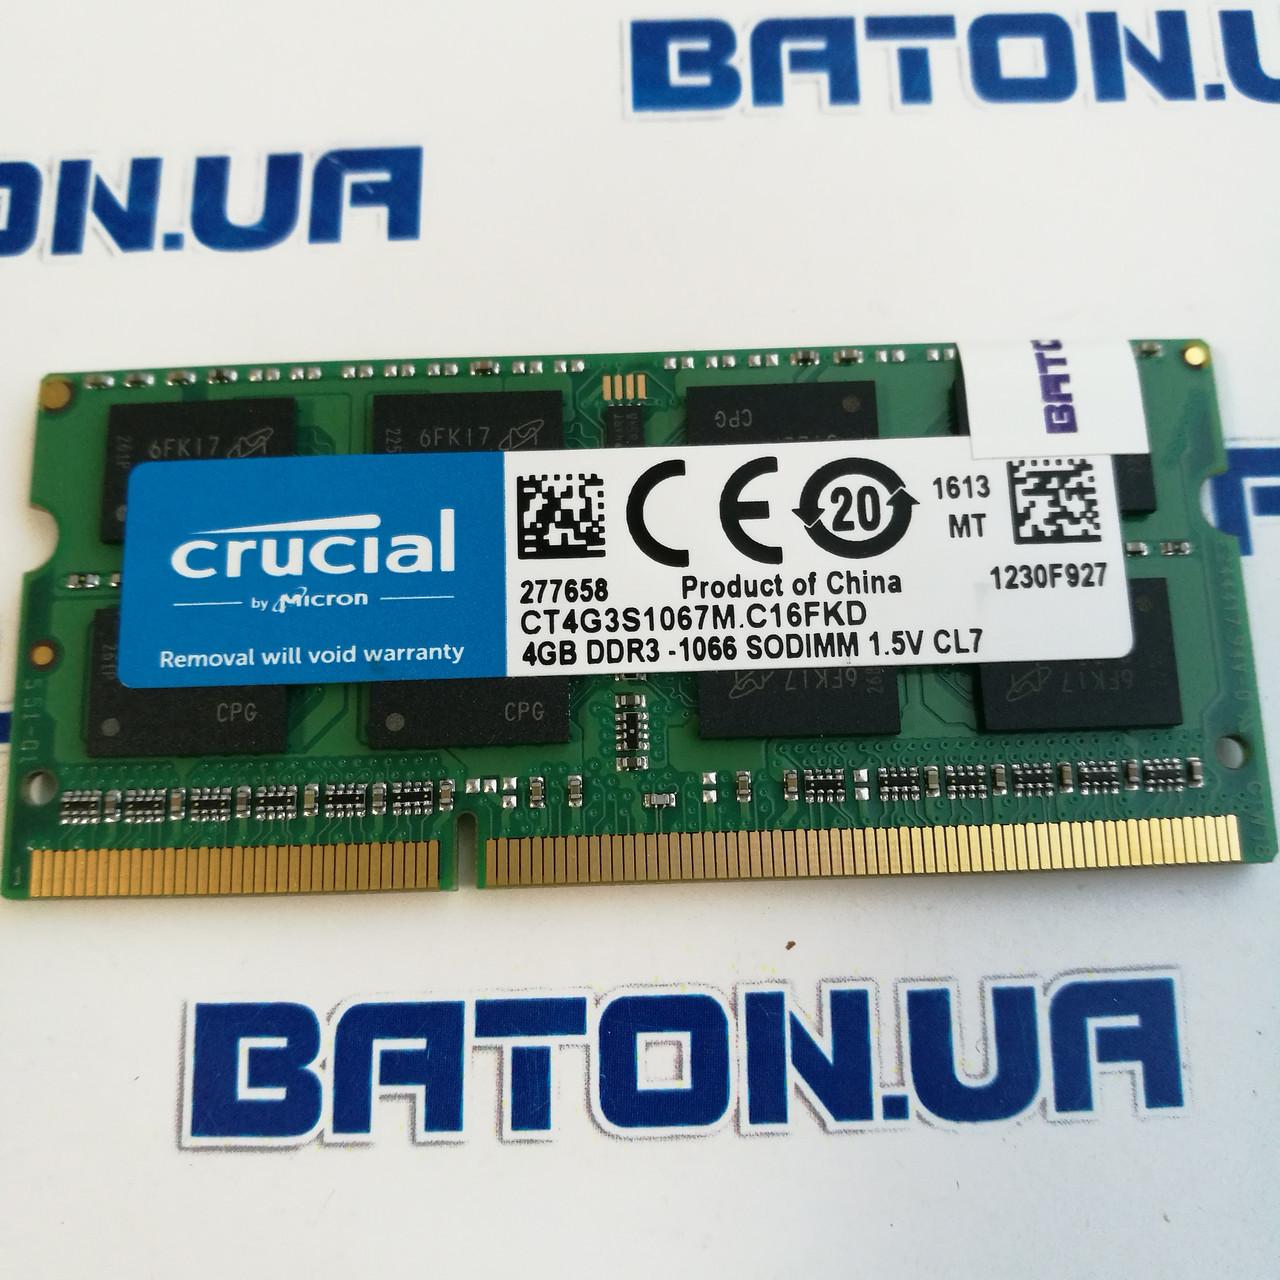 Оперативная память для ноутбука Crucial SODIMM DDR3 4Gb 1066MHz 8500s CL7 (CT4G3S1067M.C16FKD)